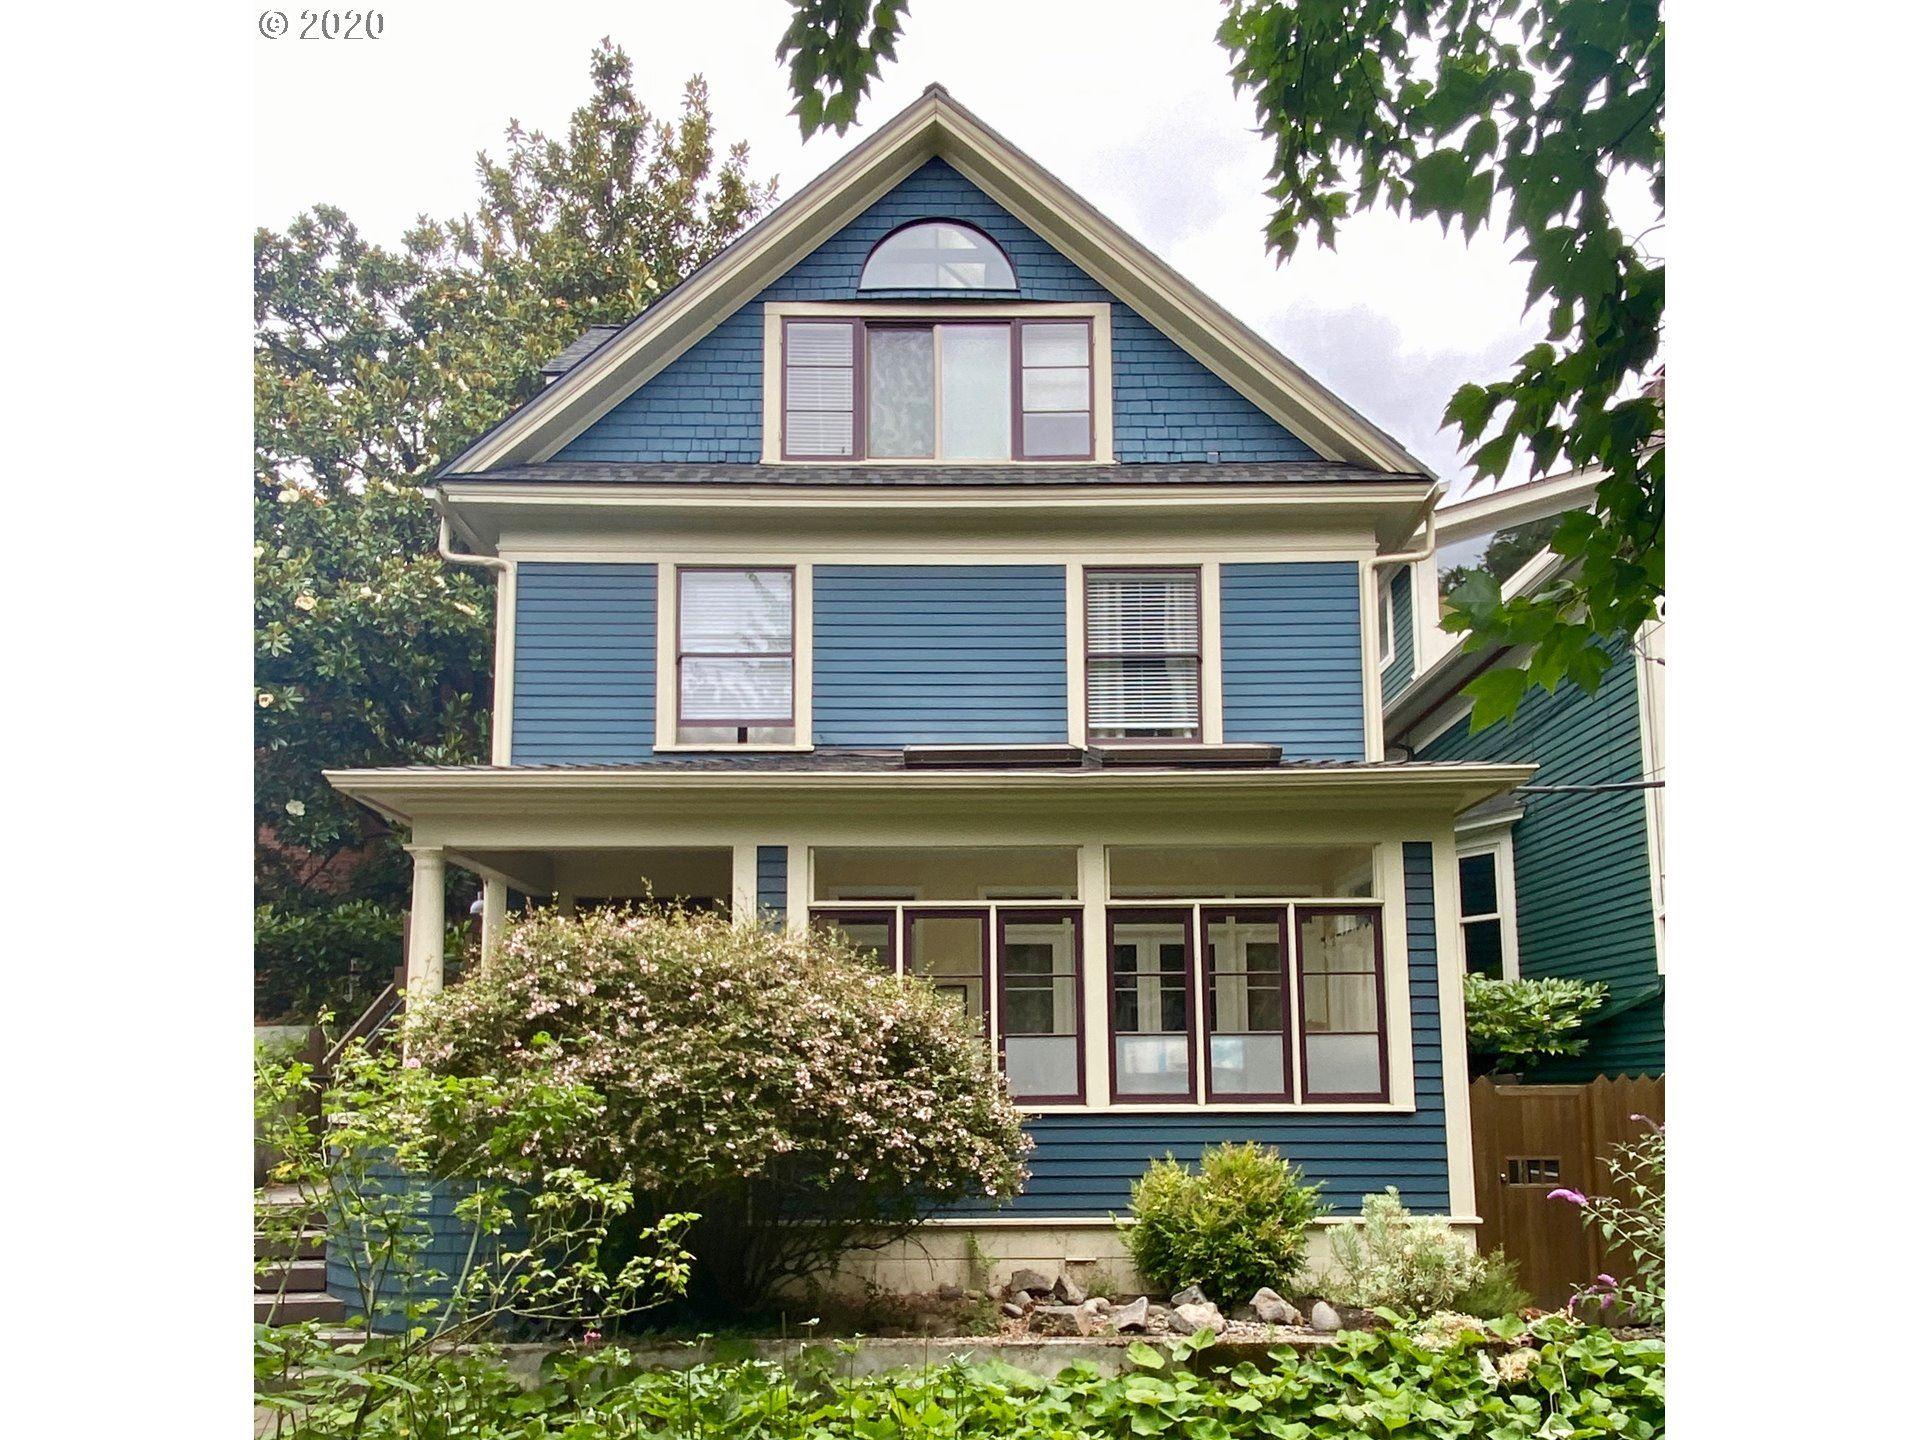 1717 NW HOYT ST, Portland, OR 97209 - MLS#: 20007696